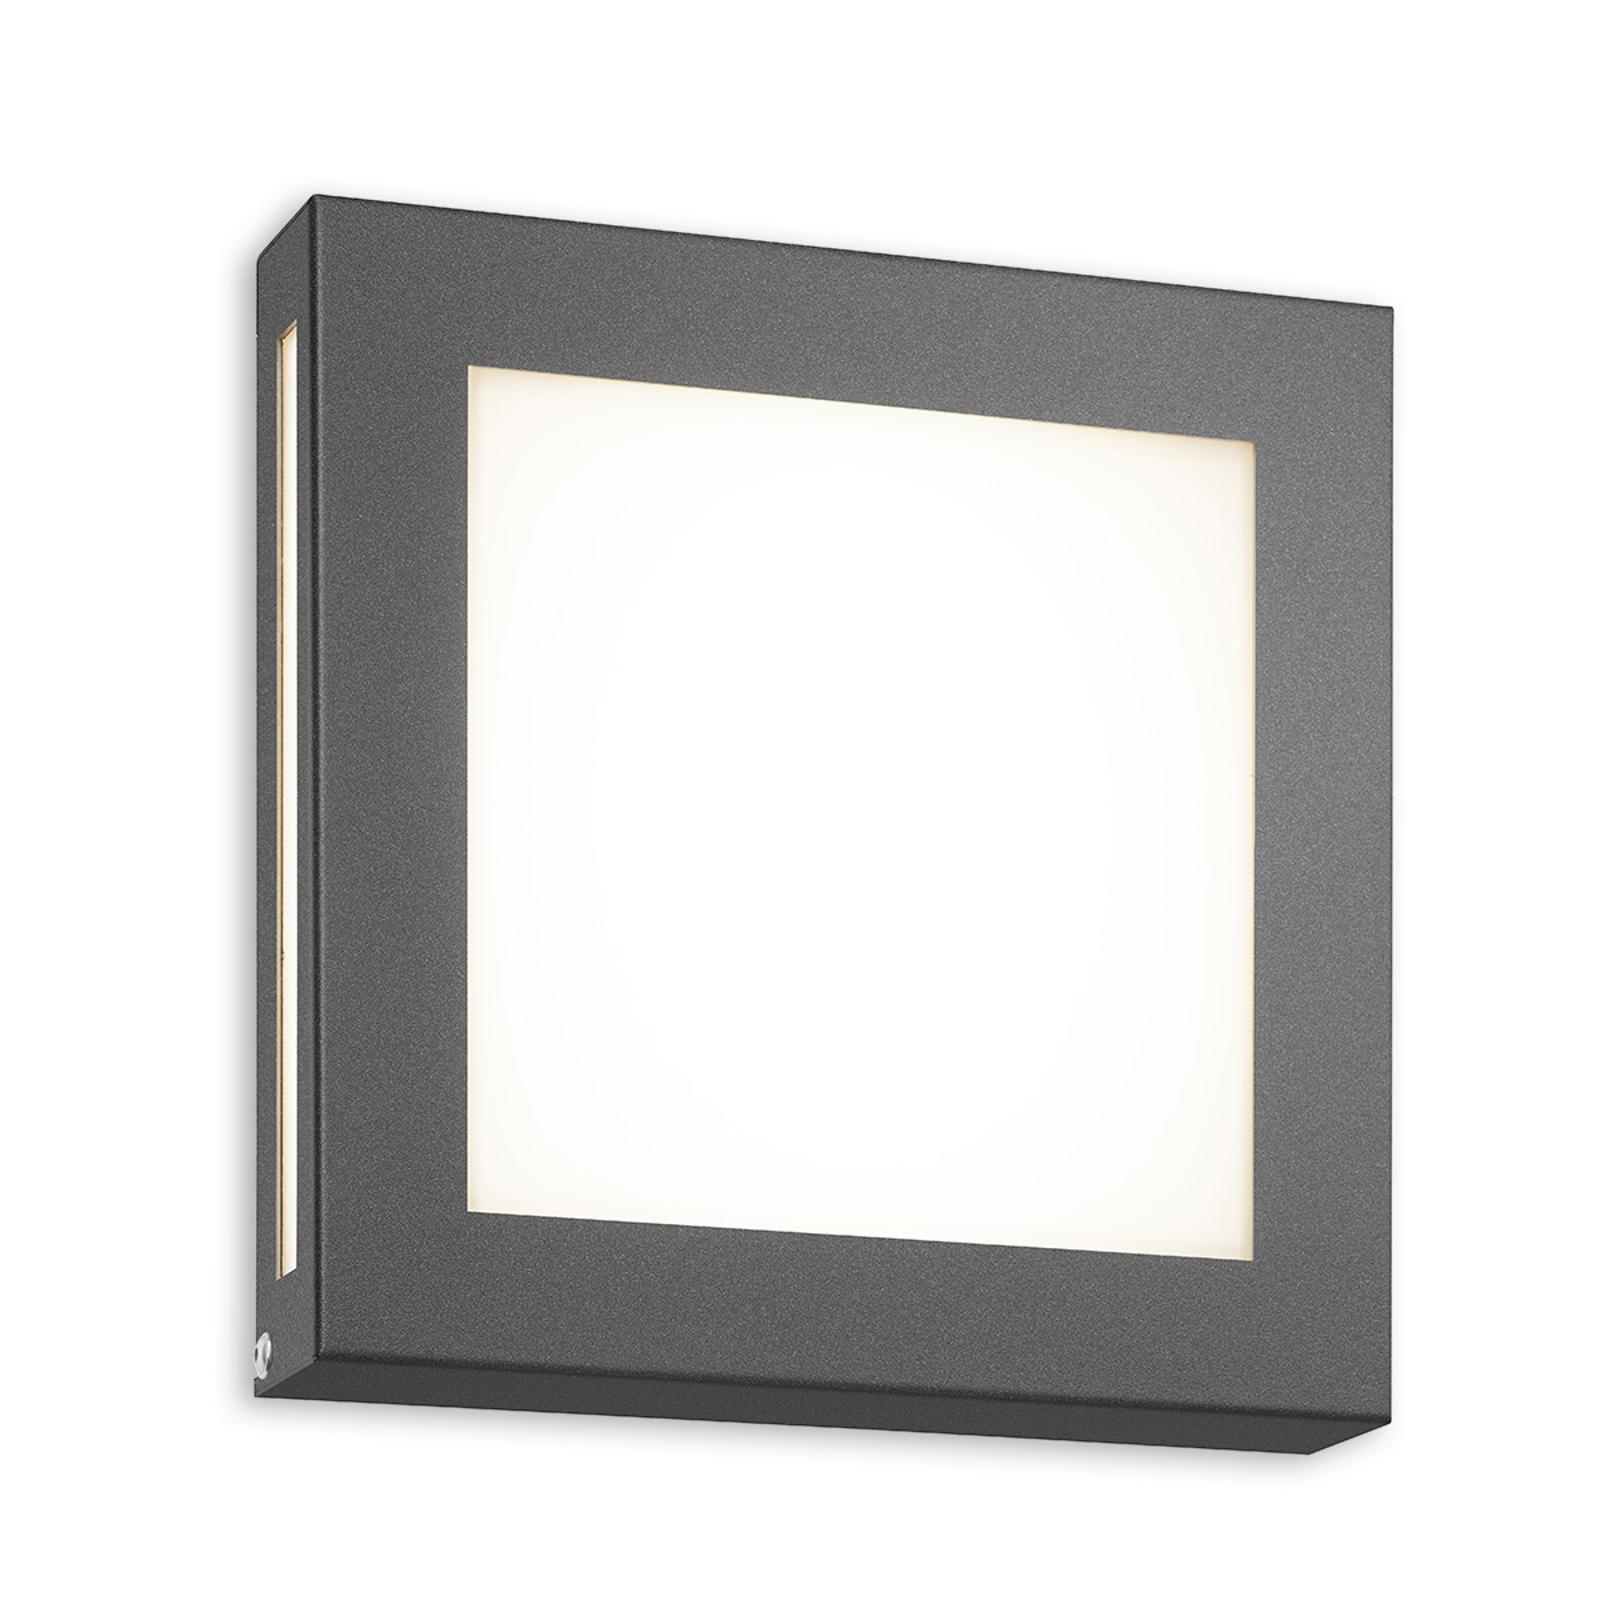 LED-Außenwandleuchte Aqua Legendo Mini, anthrazit